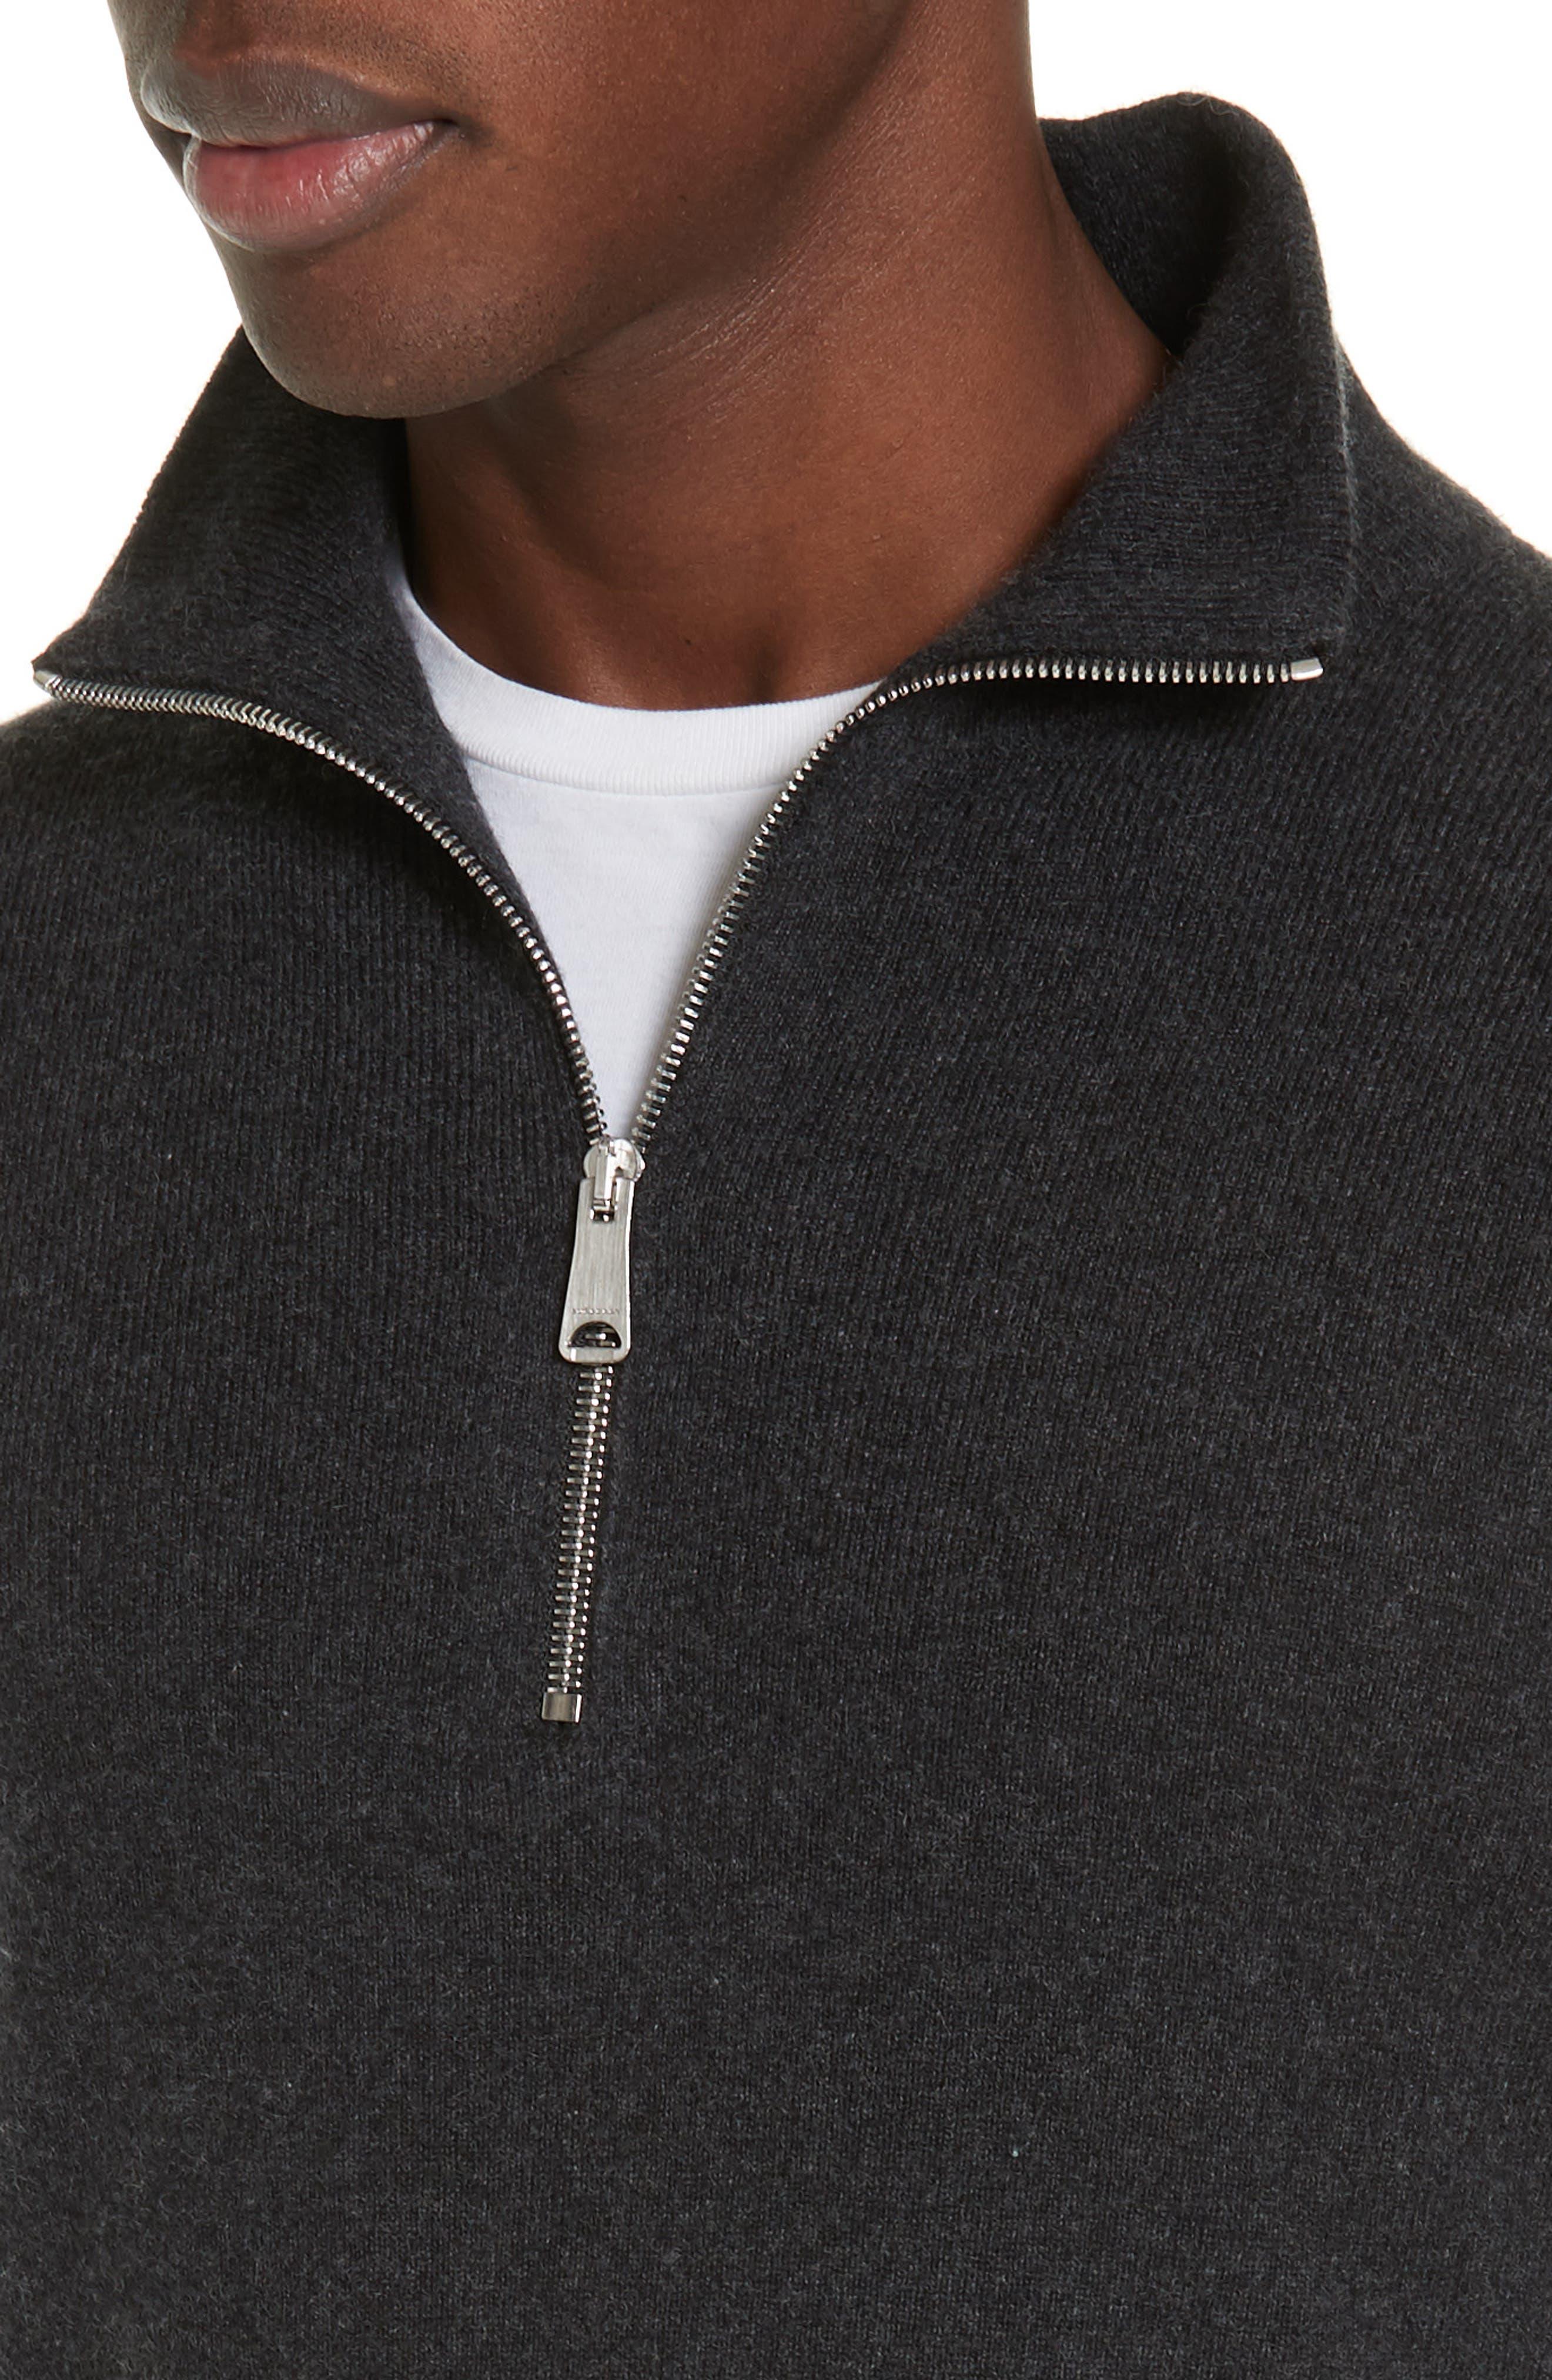 Hendon Quarter Zip Cashmere Sweater,                             Alternate thumbnail 4, color,                             CHARCOAL MELANGE